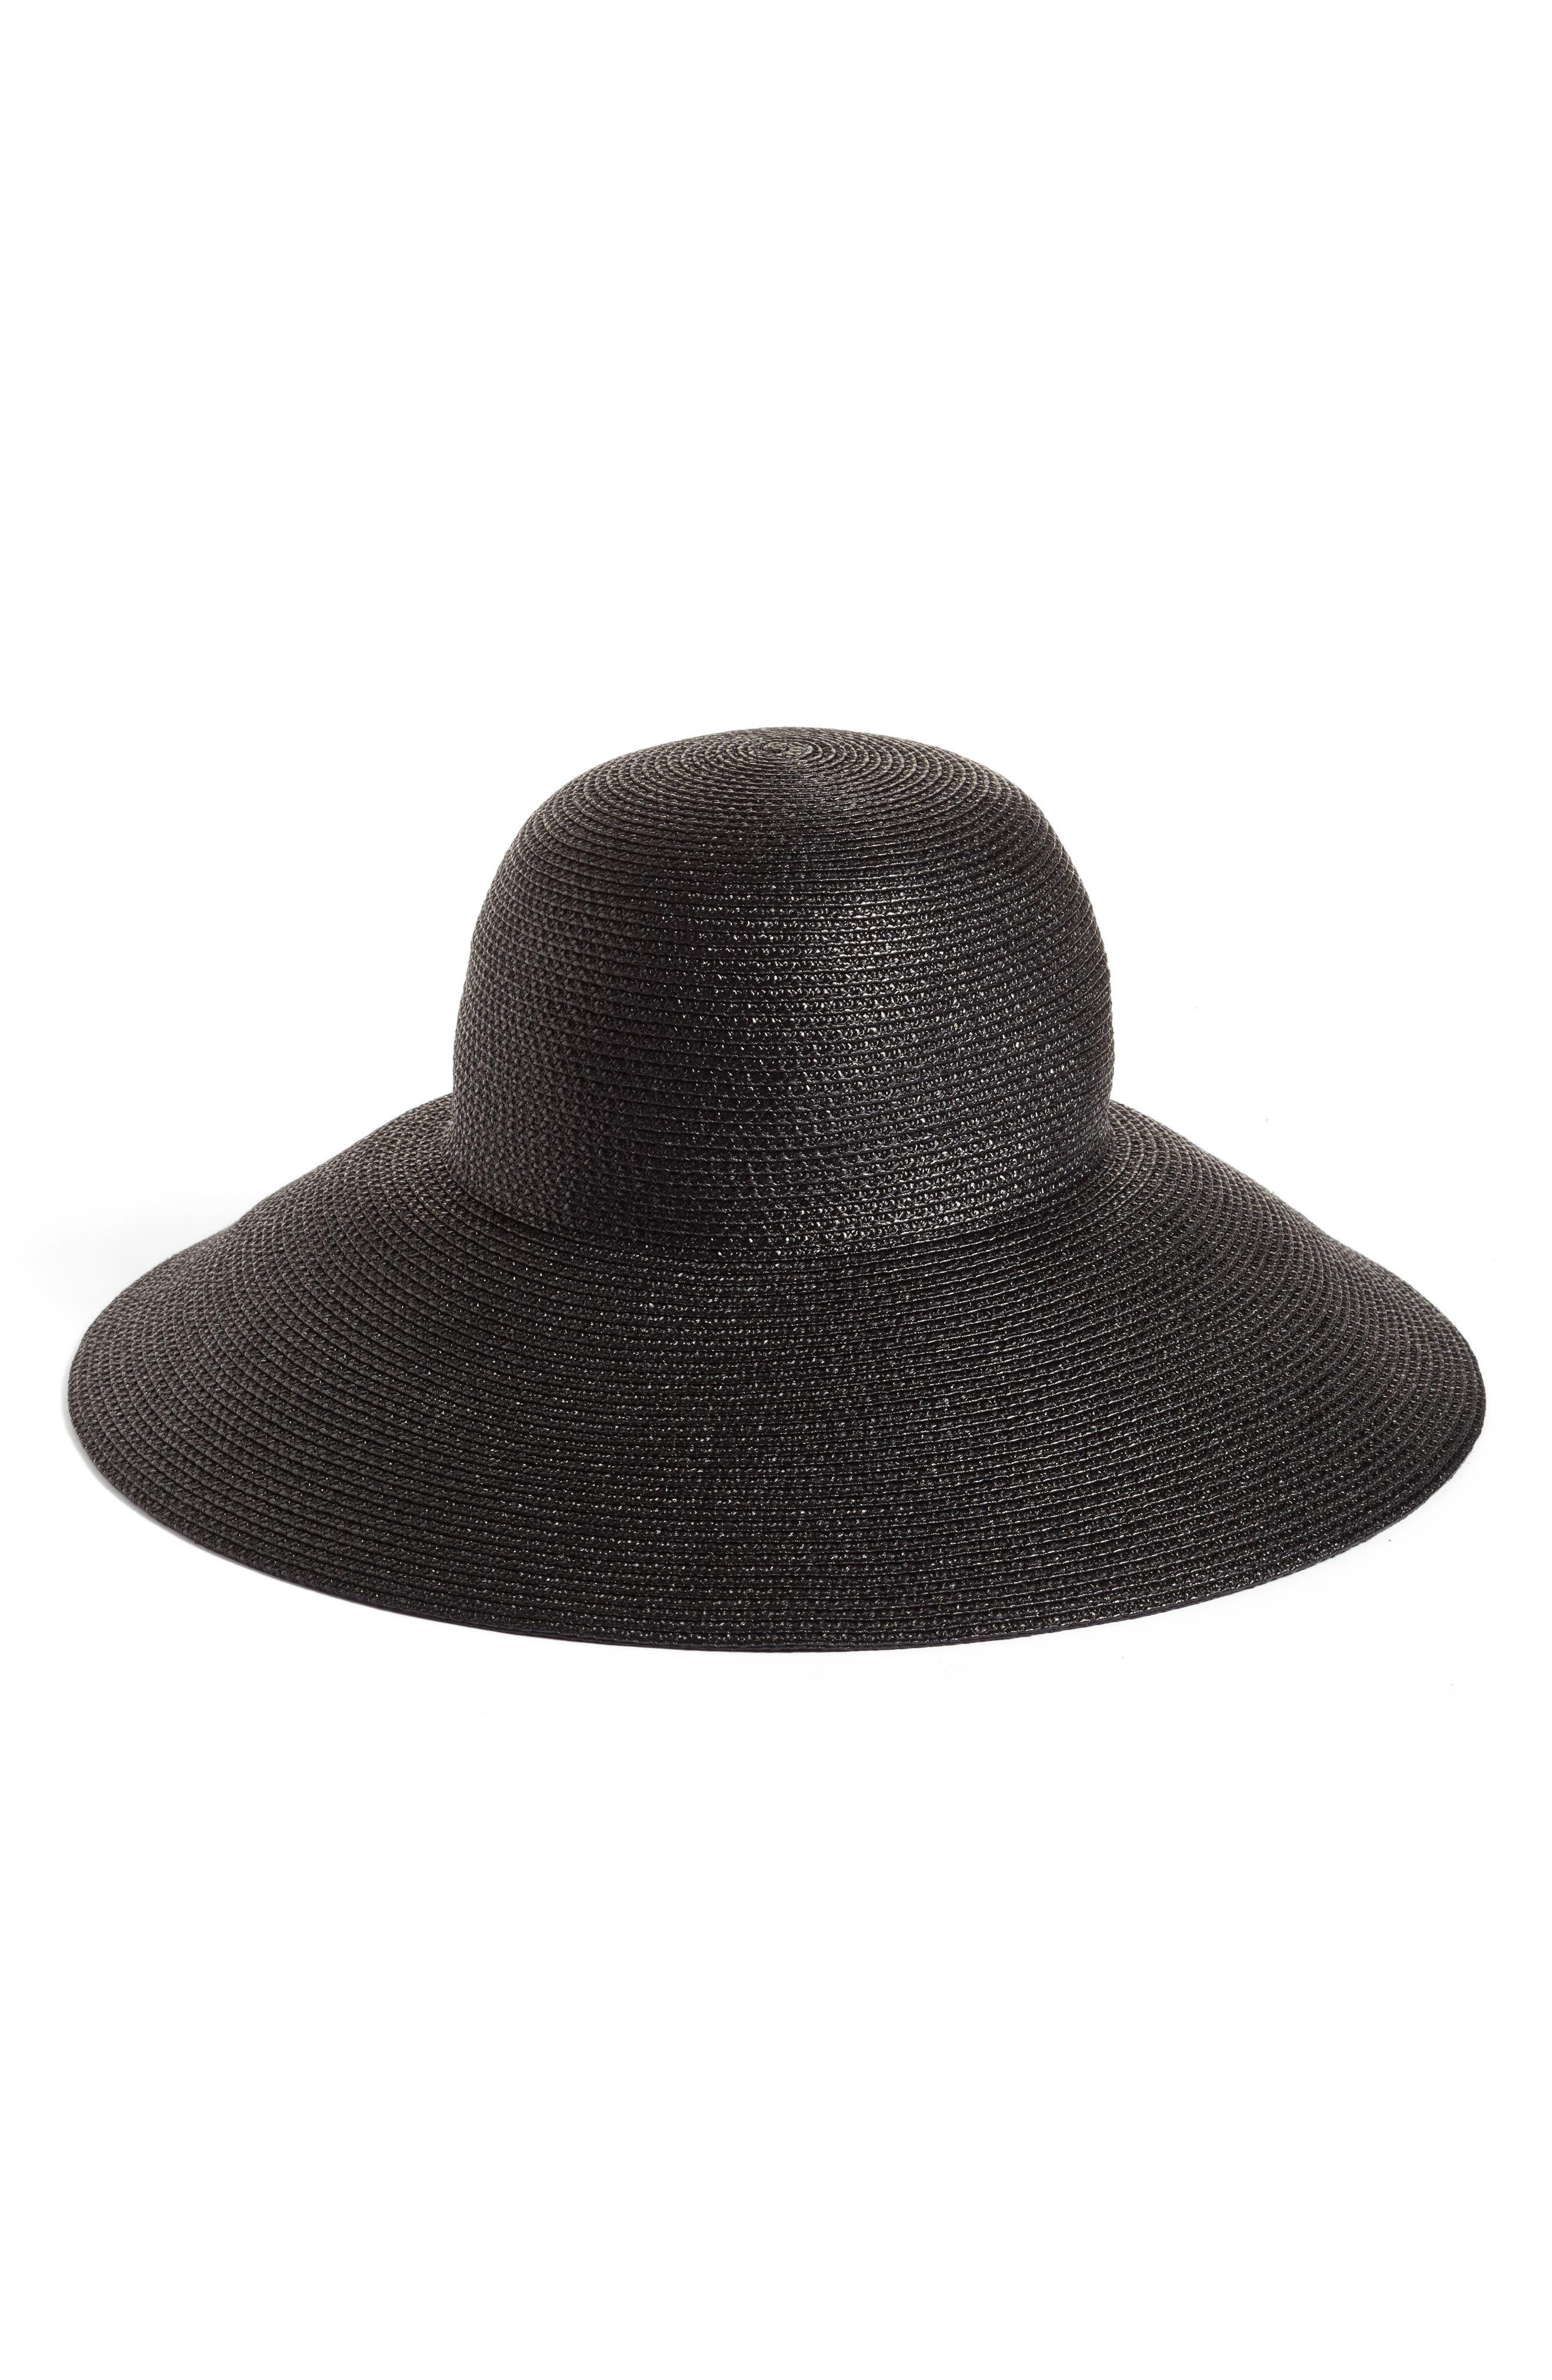 Eric Javits Bella Squishee® Sun Hat